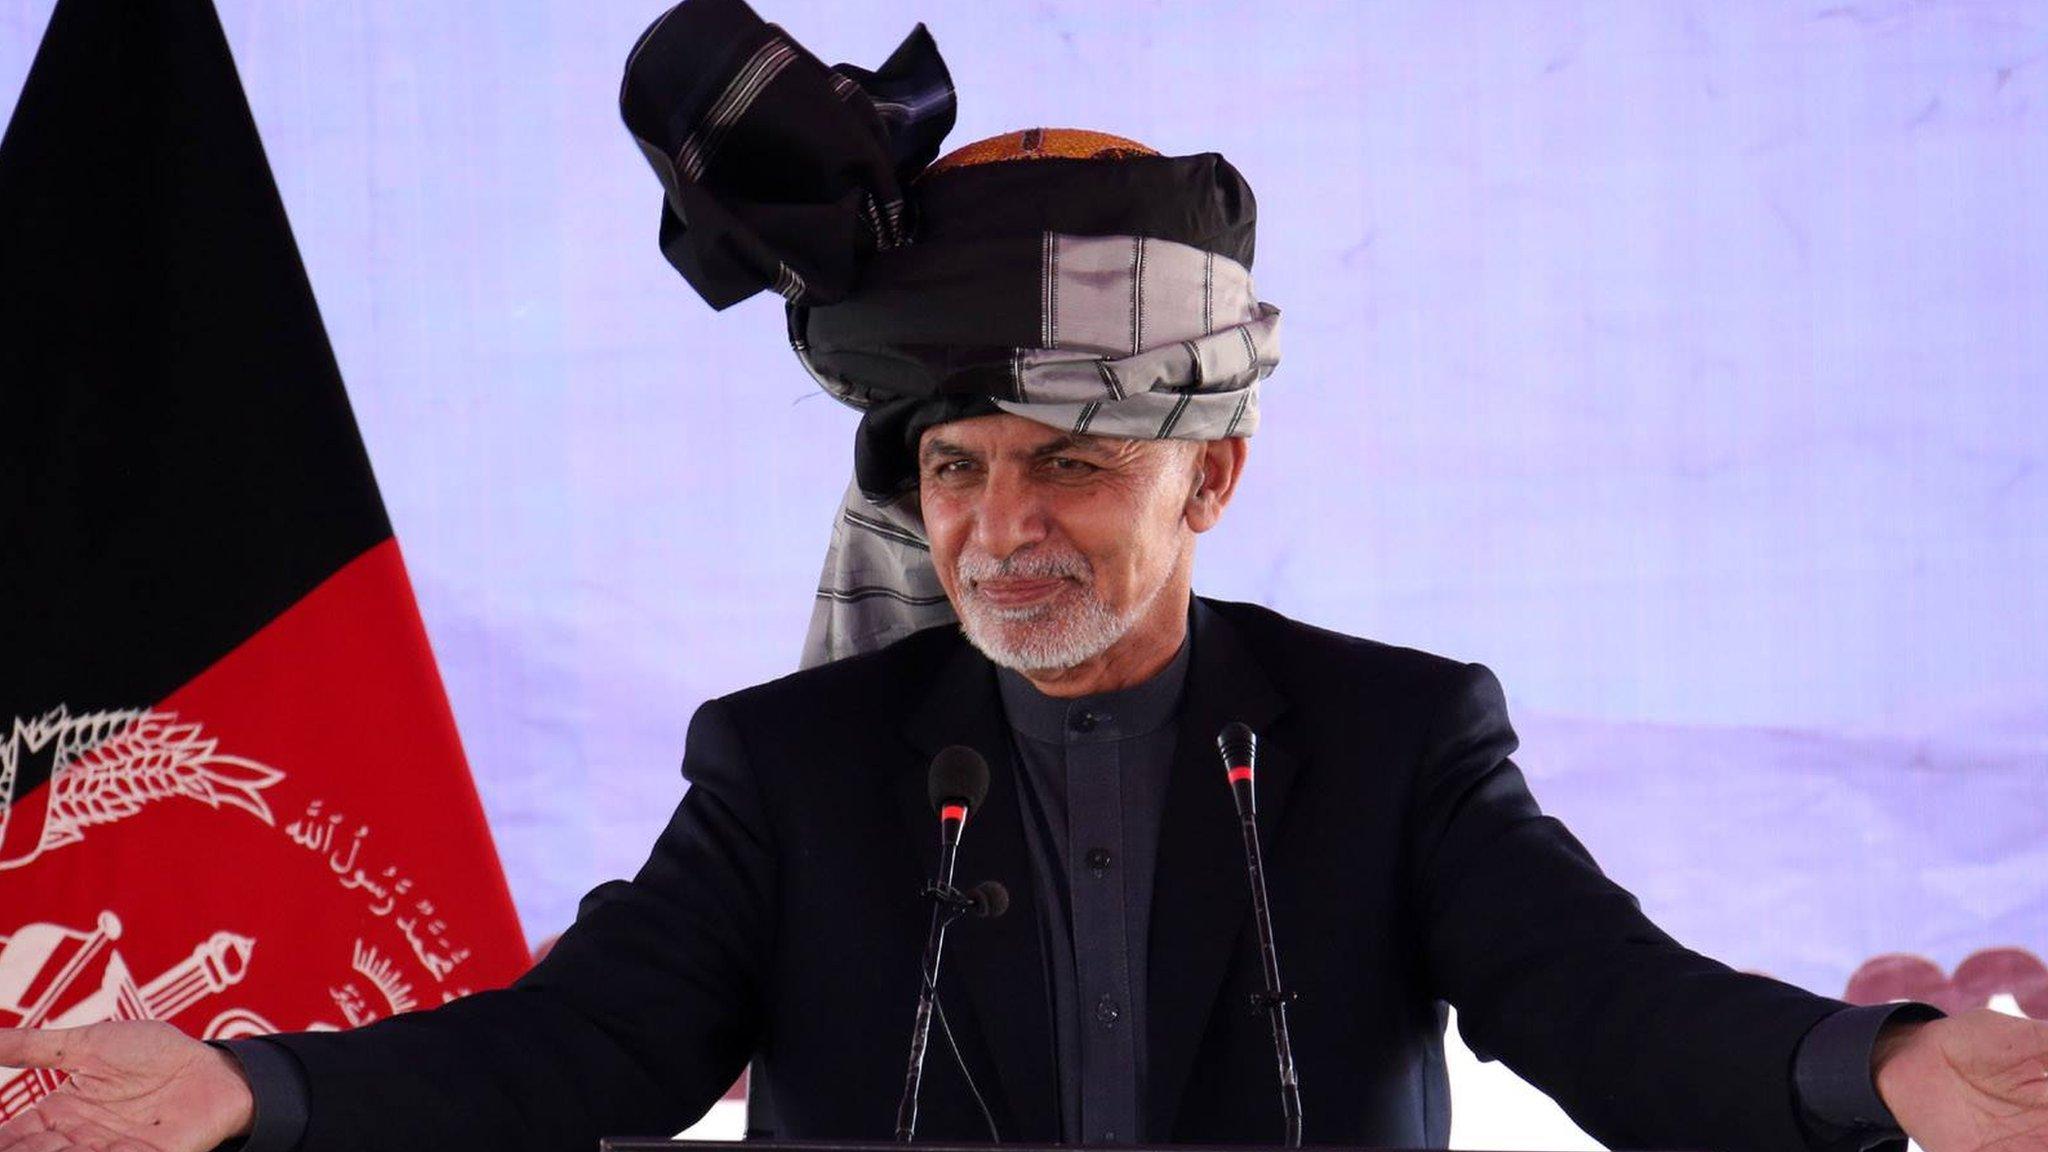 غني: طالبانو ته کابل، کندهار یا ننګرهار کې دفتر ورکولی شو